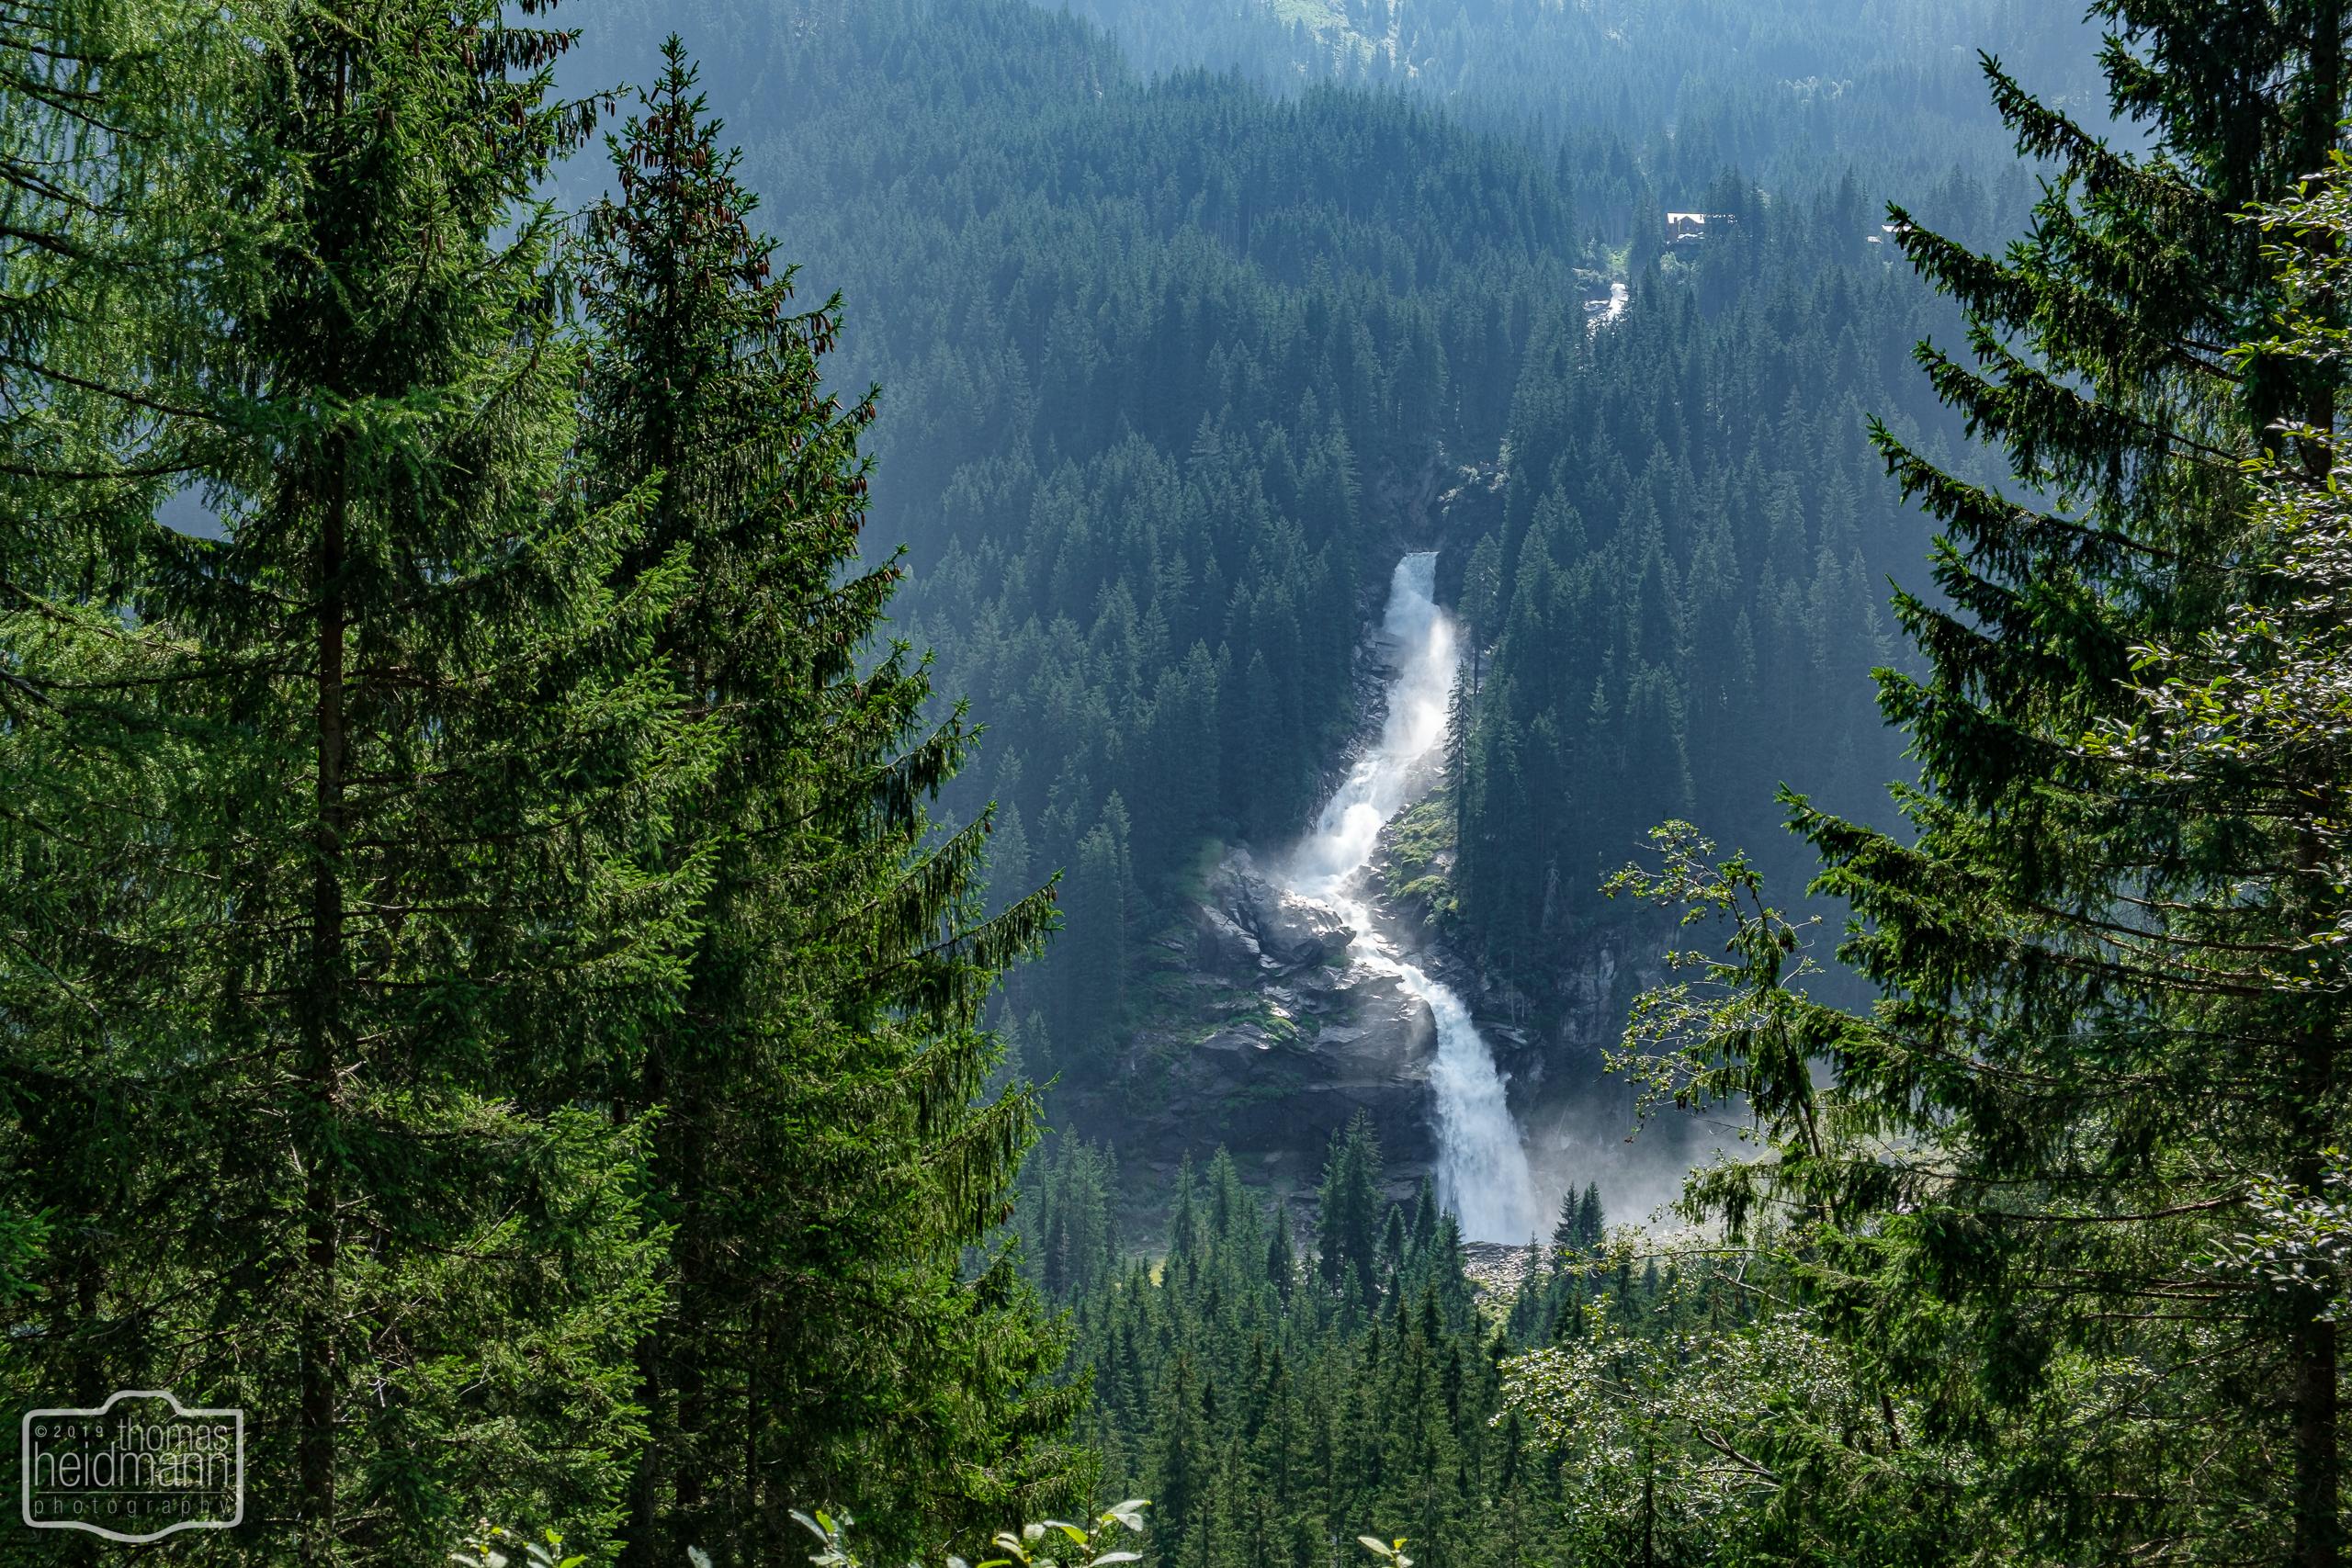 Radtour durchs Krimmler Achental - Krimmler Wasserfall